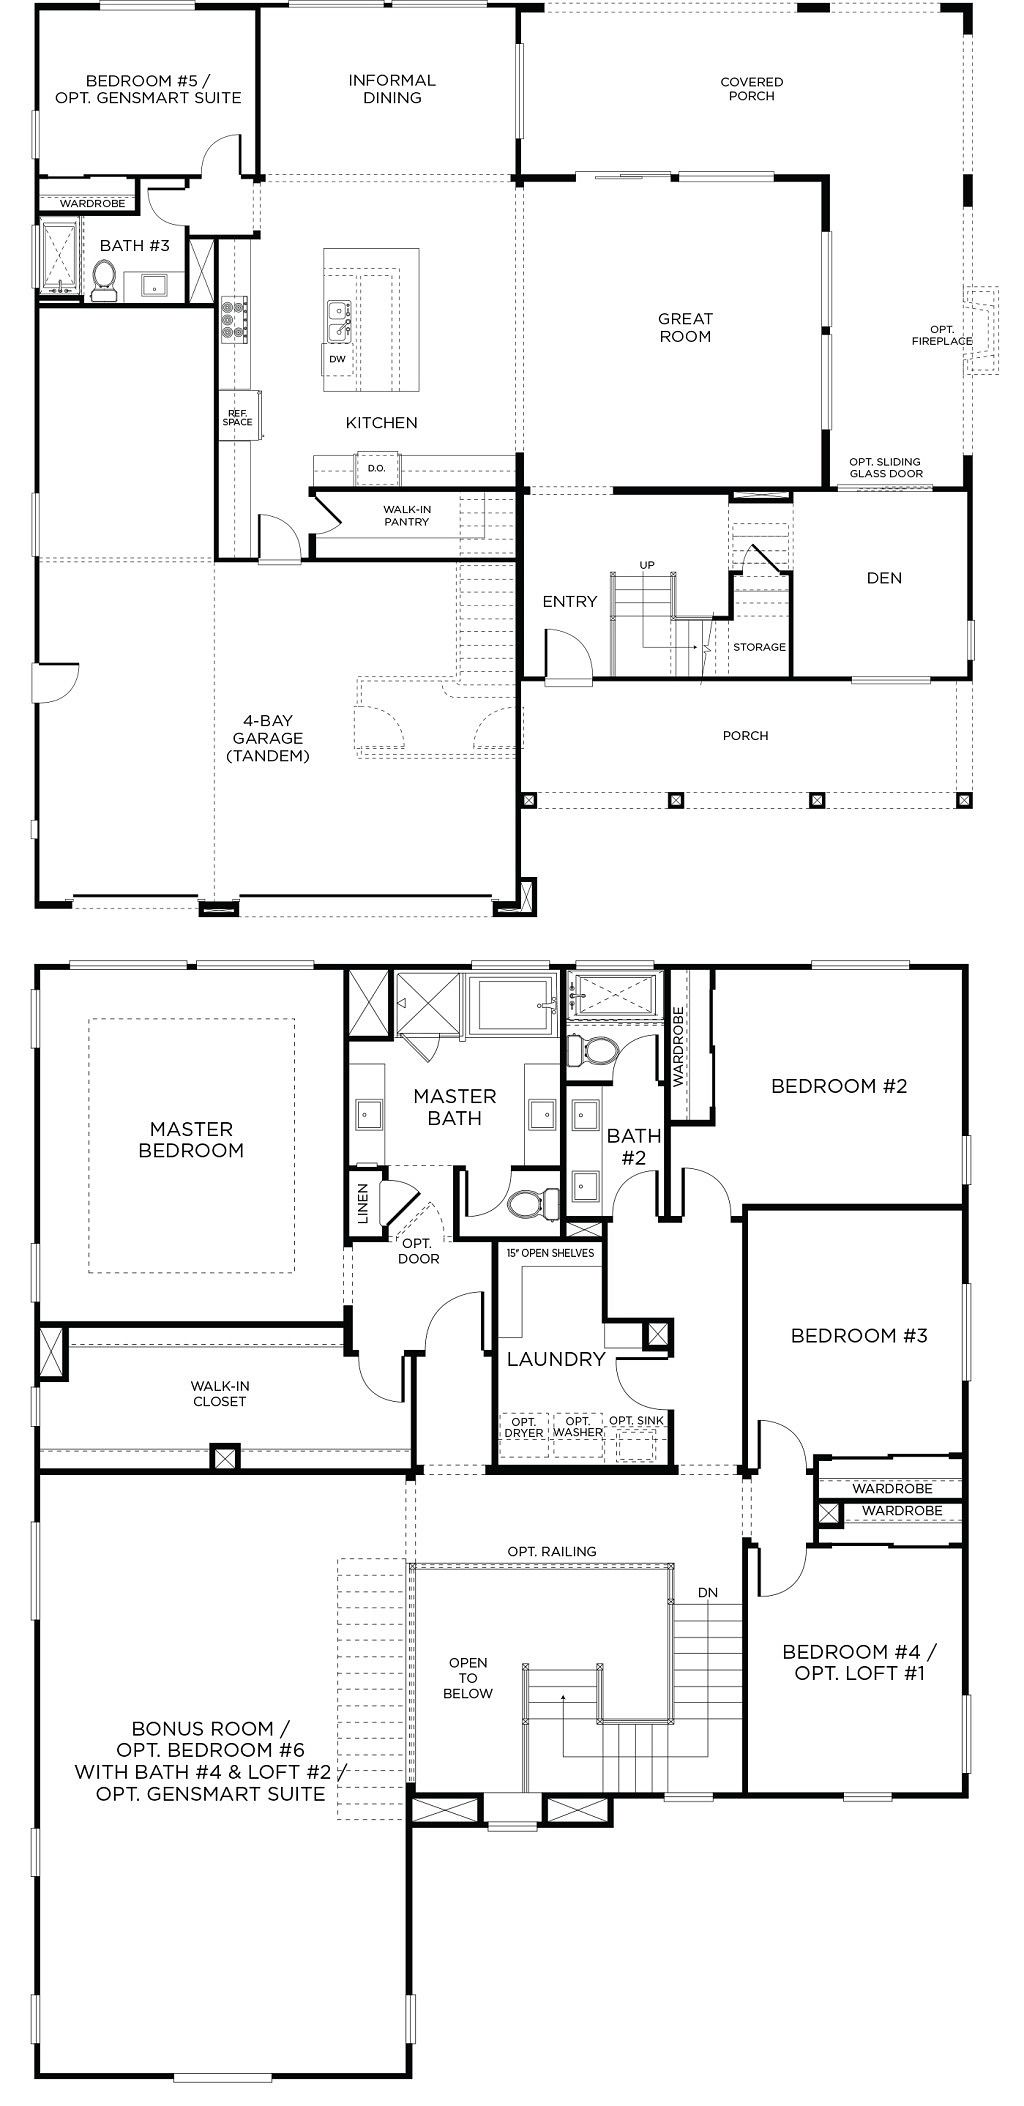 Turn garage into master bedroom  Floor Plan  The Flagstone Neighborhood in Beaumont CA  Large